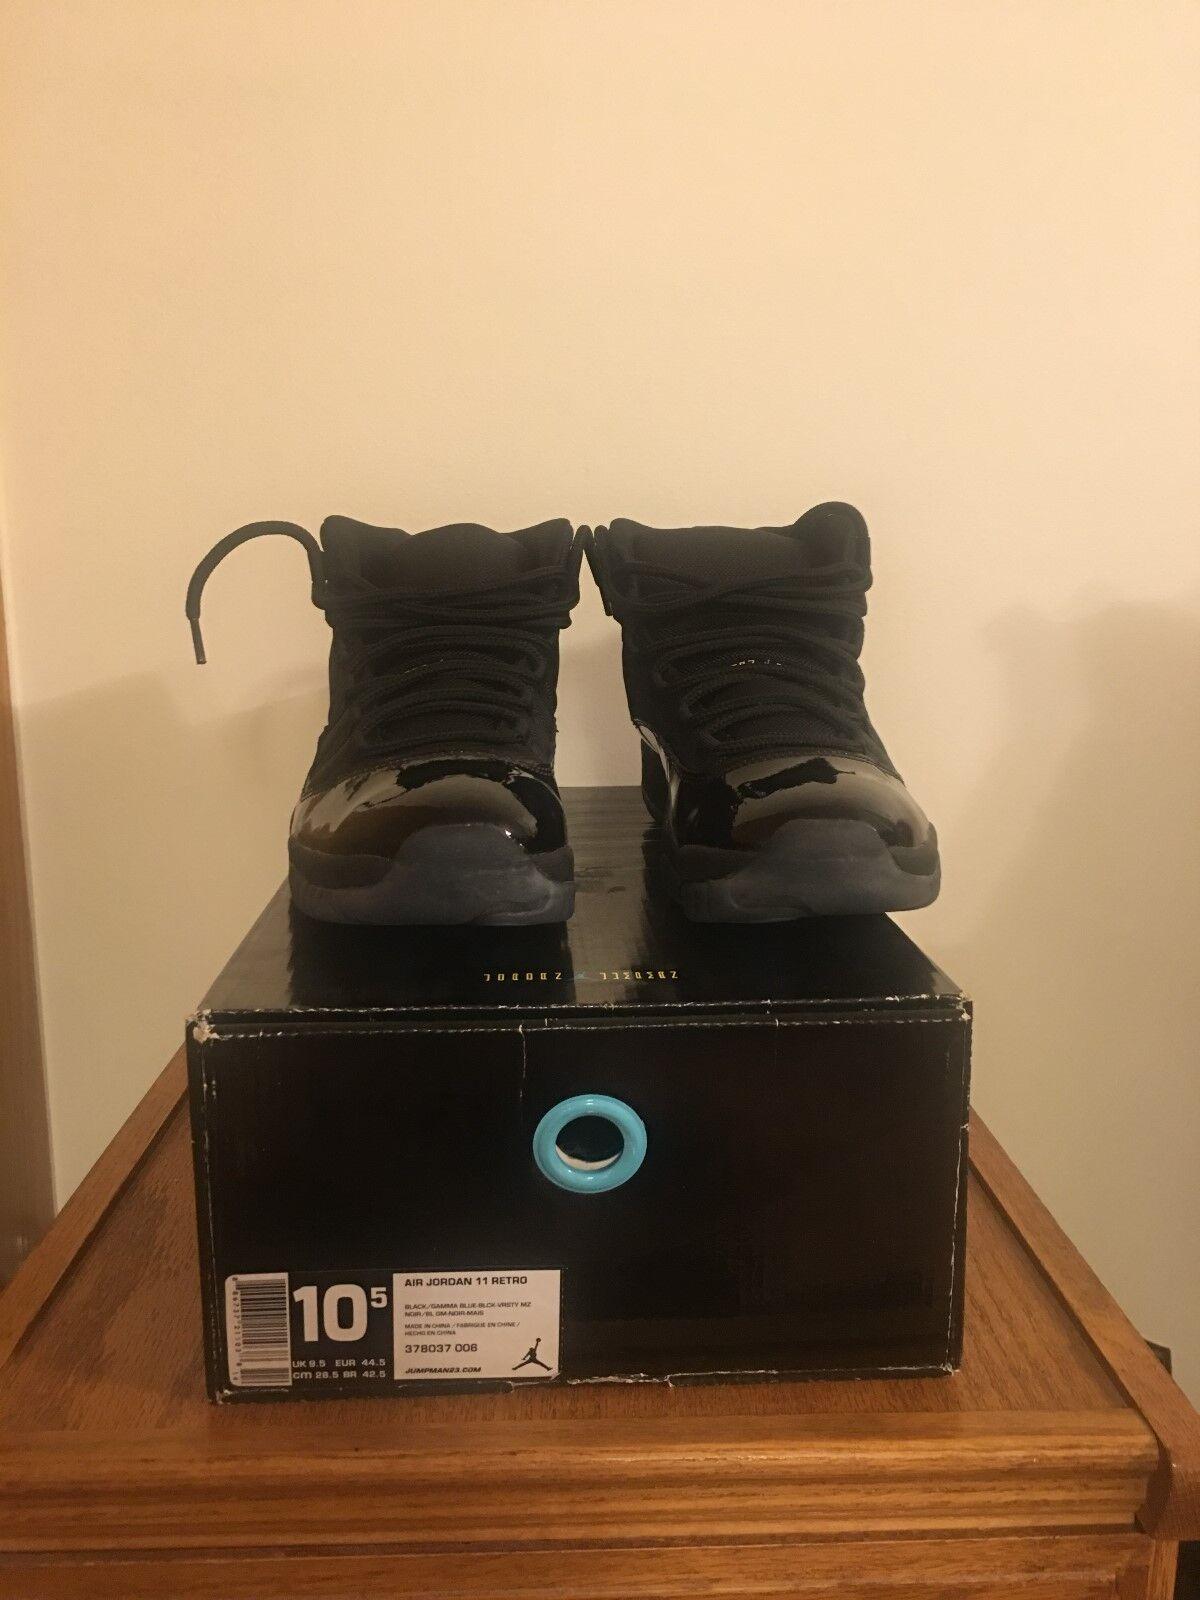 b80789c76476 Jordan 11 Gamma bluee VNDS size 10.5 nozkiu2013-Athletic Shoes ...